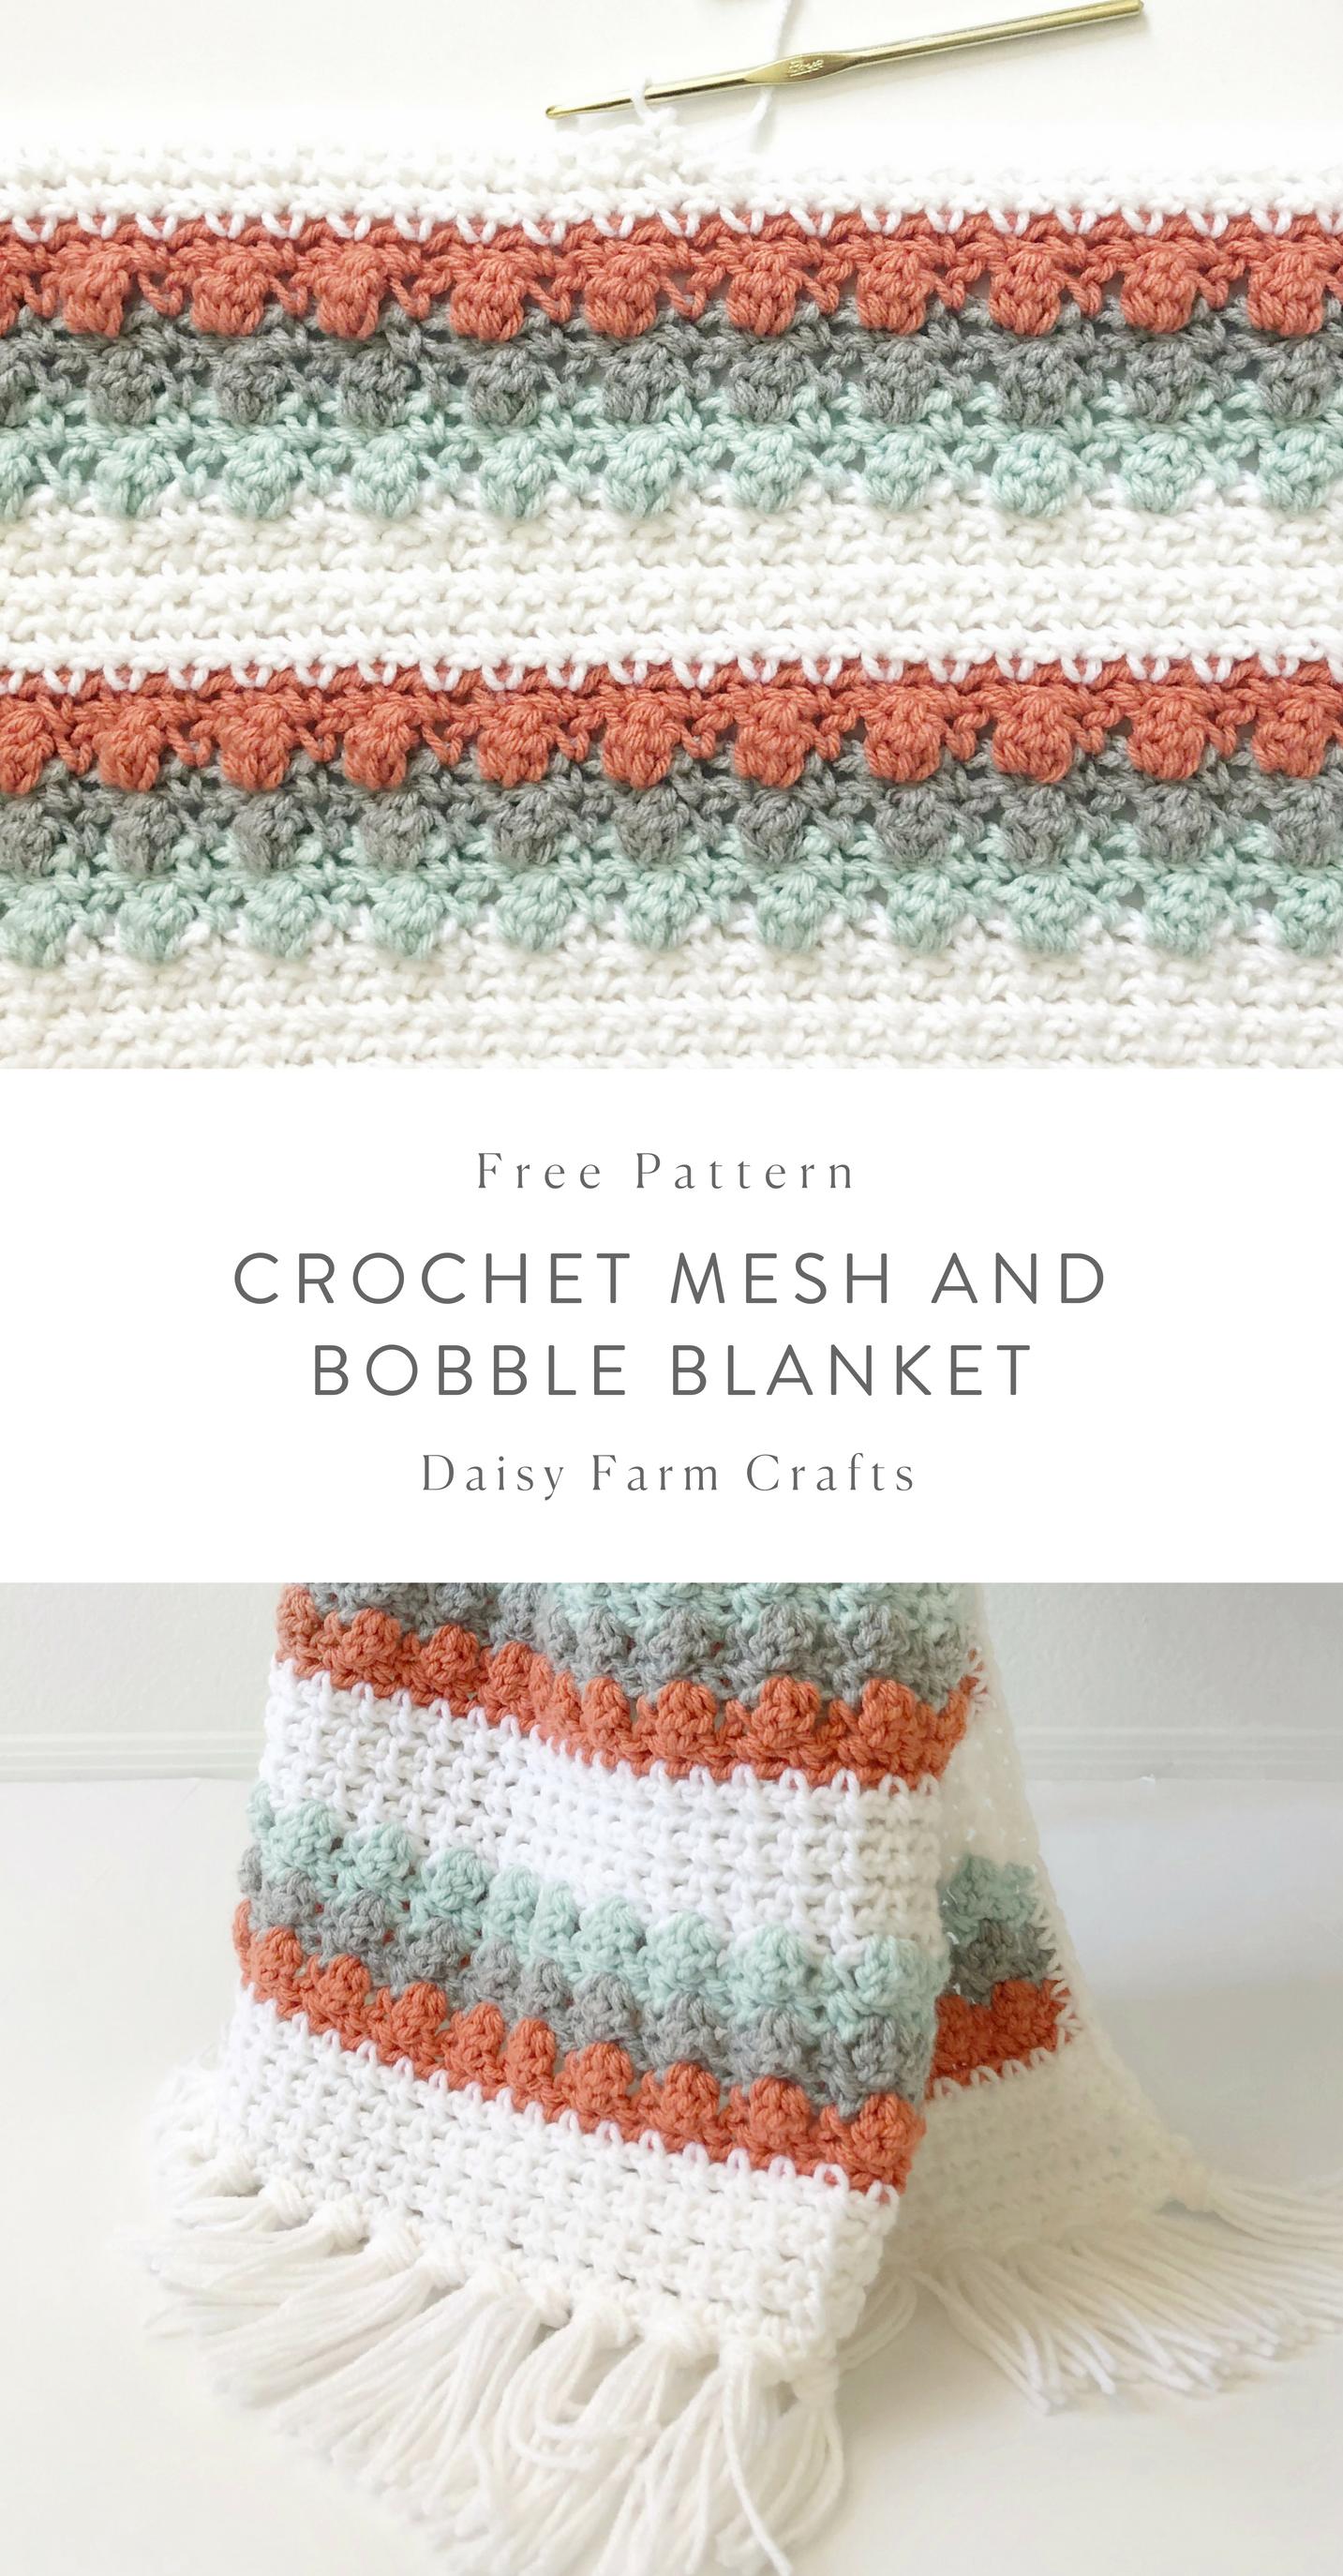 Free Pattern - Crochet Mesh and Bobble Blanket #crochet | tejidos ...